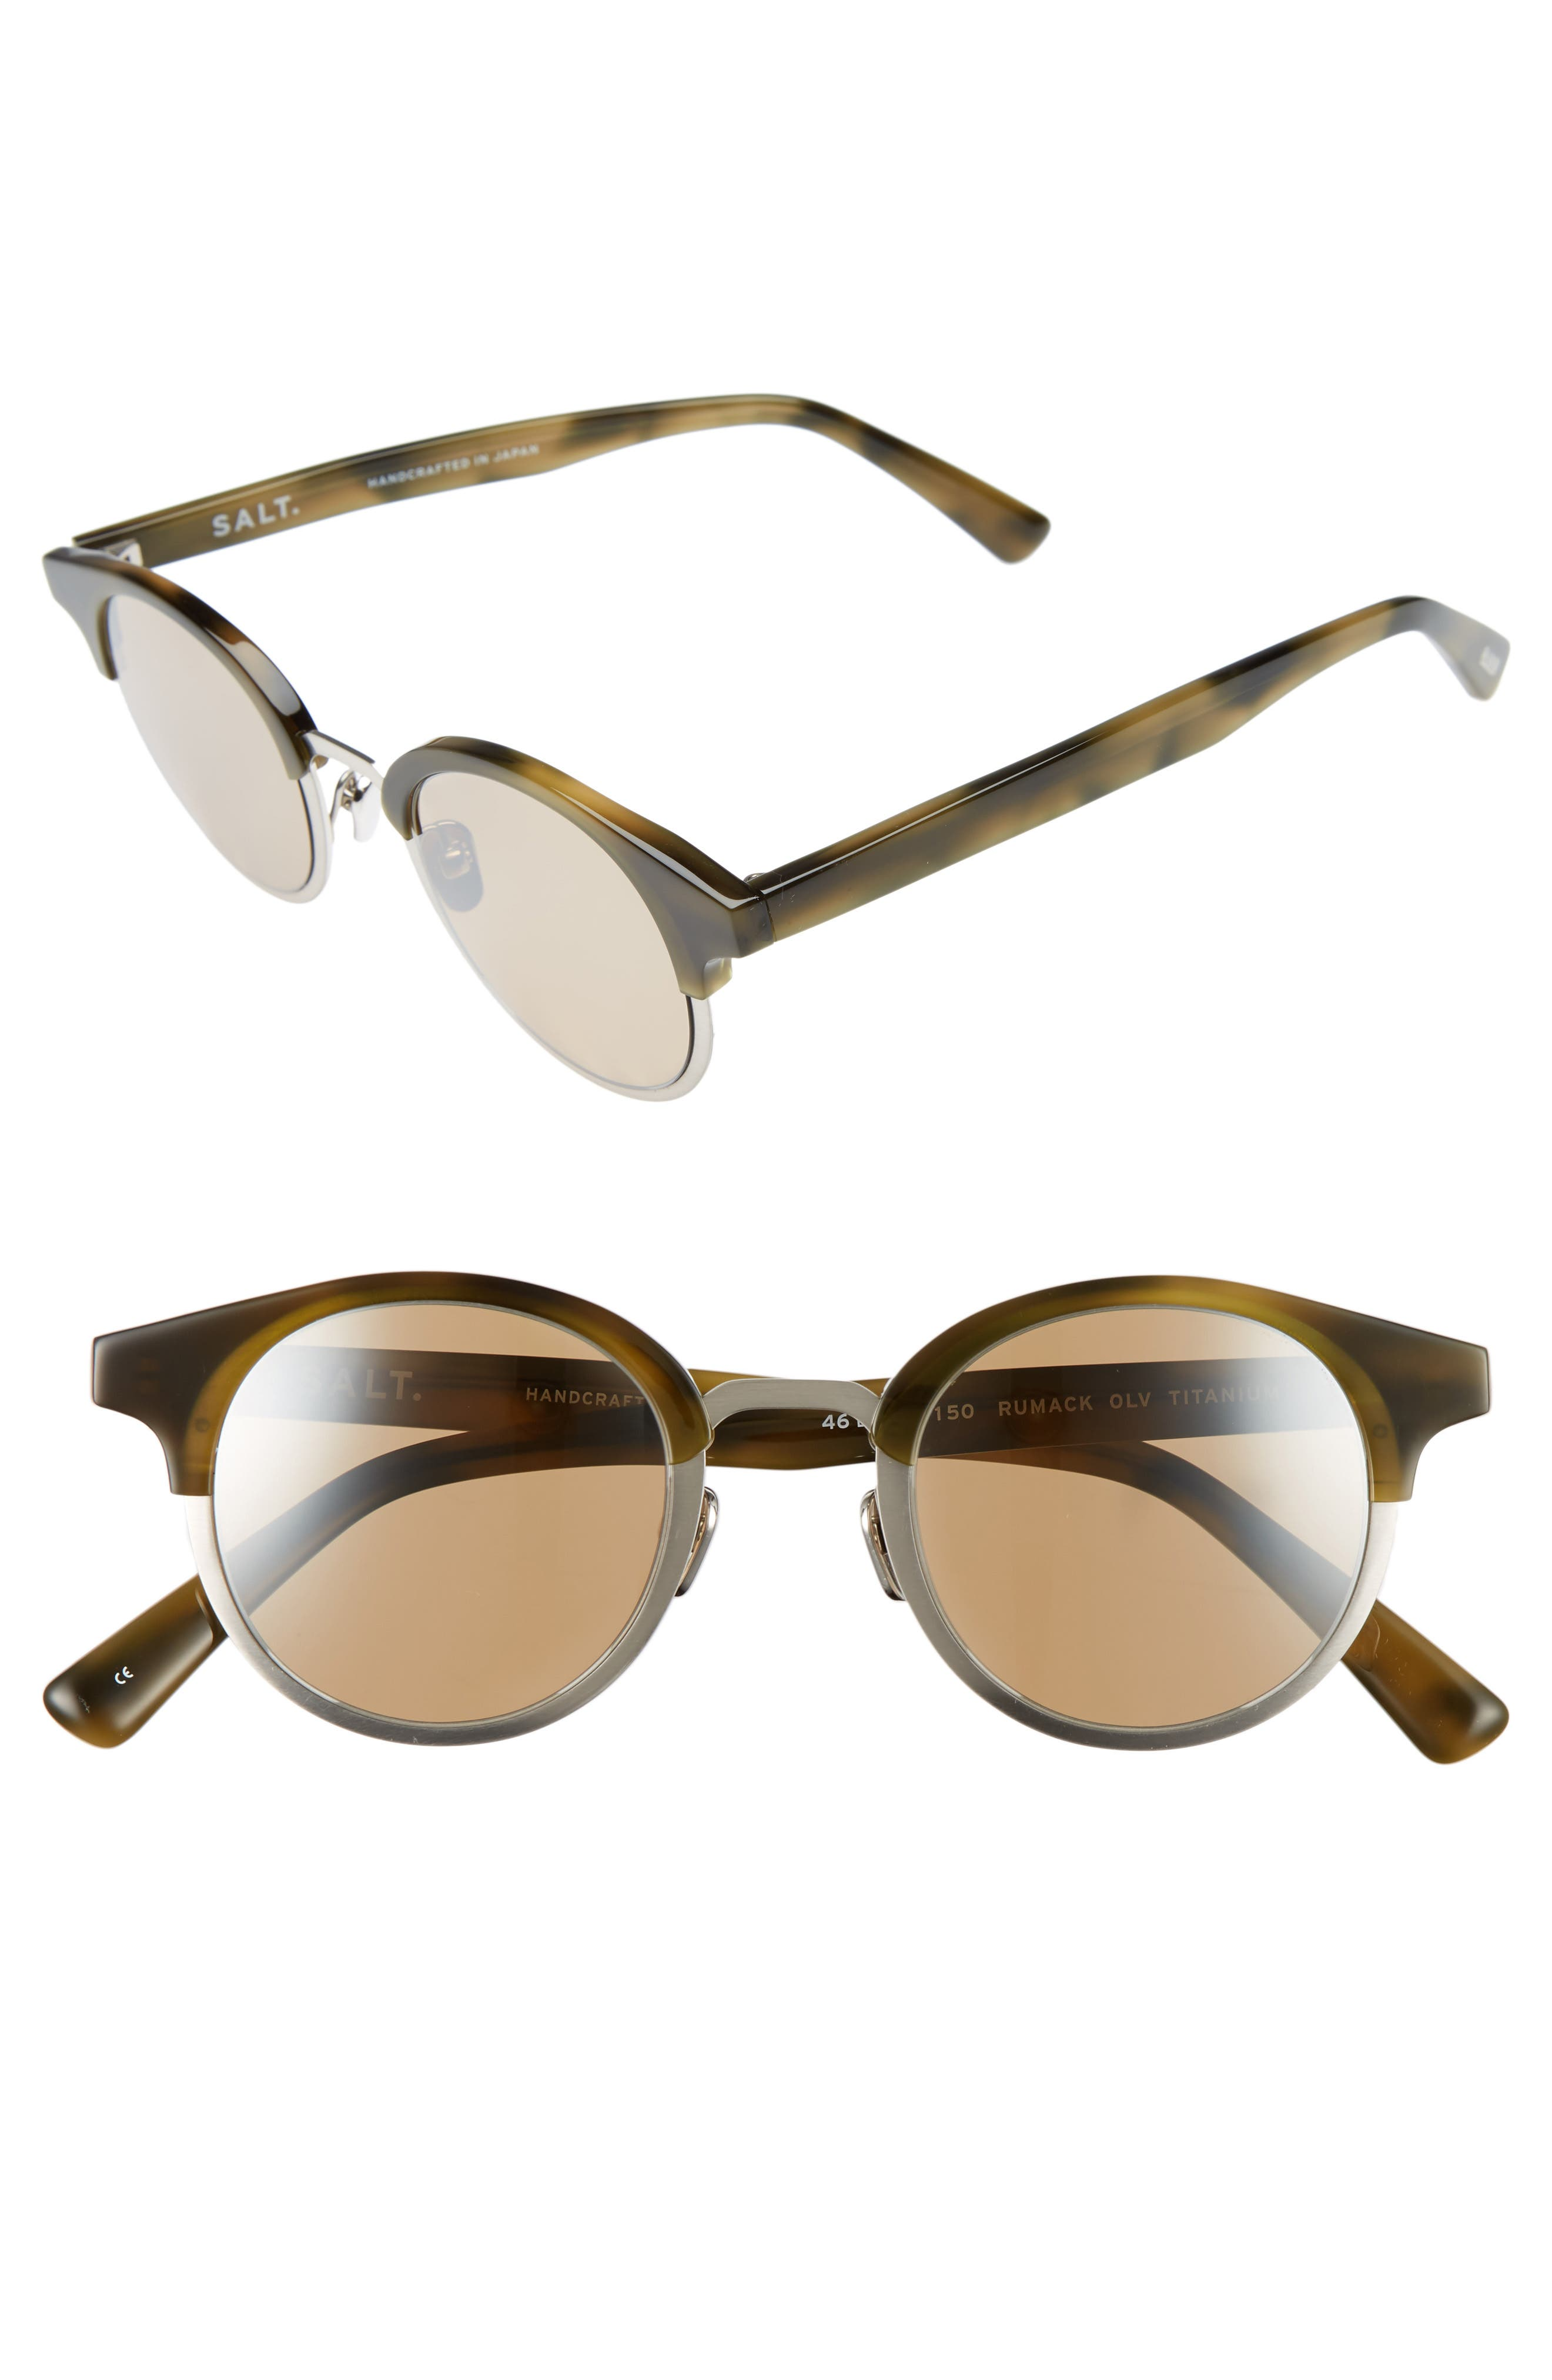 Rumack 46mm Polarized Sunglasses,                         Main,                         color, OLIVE